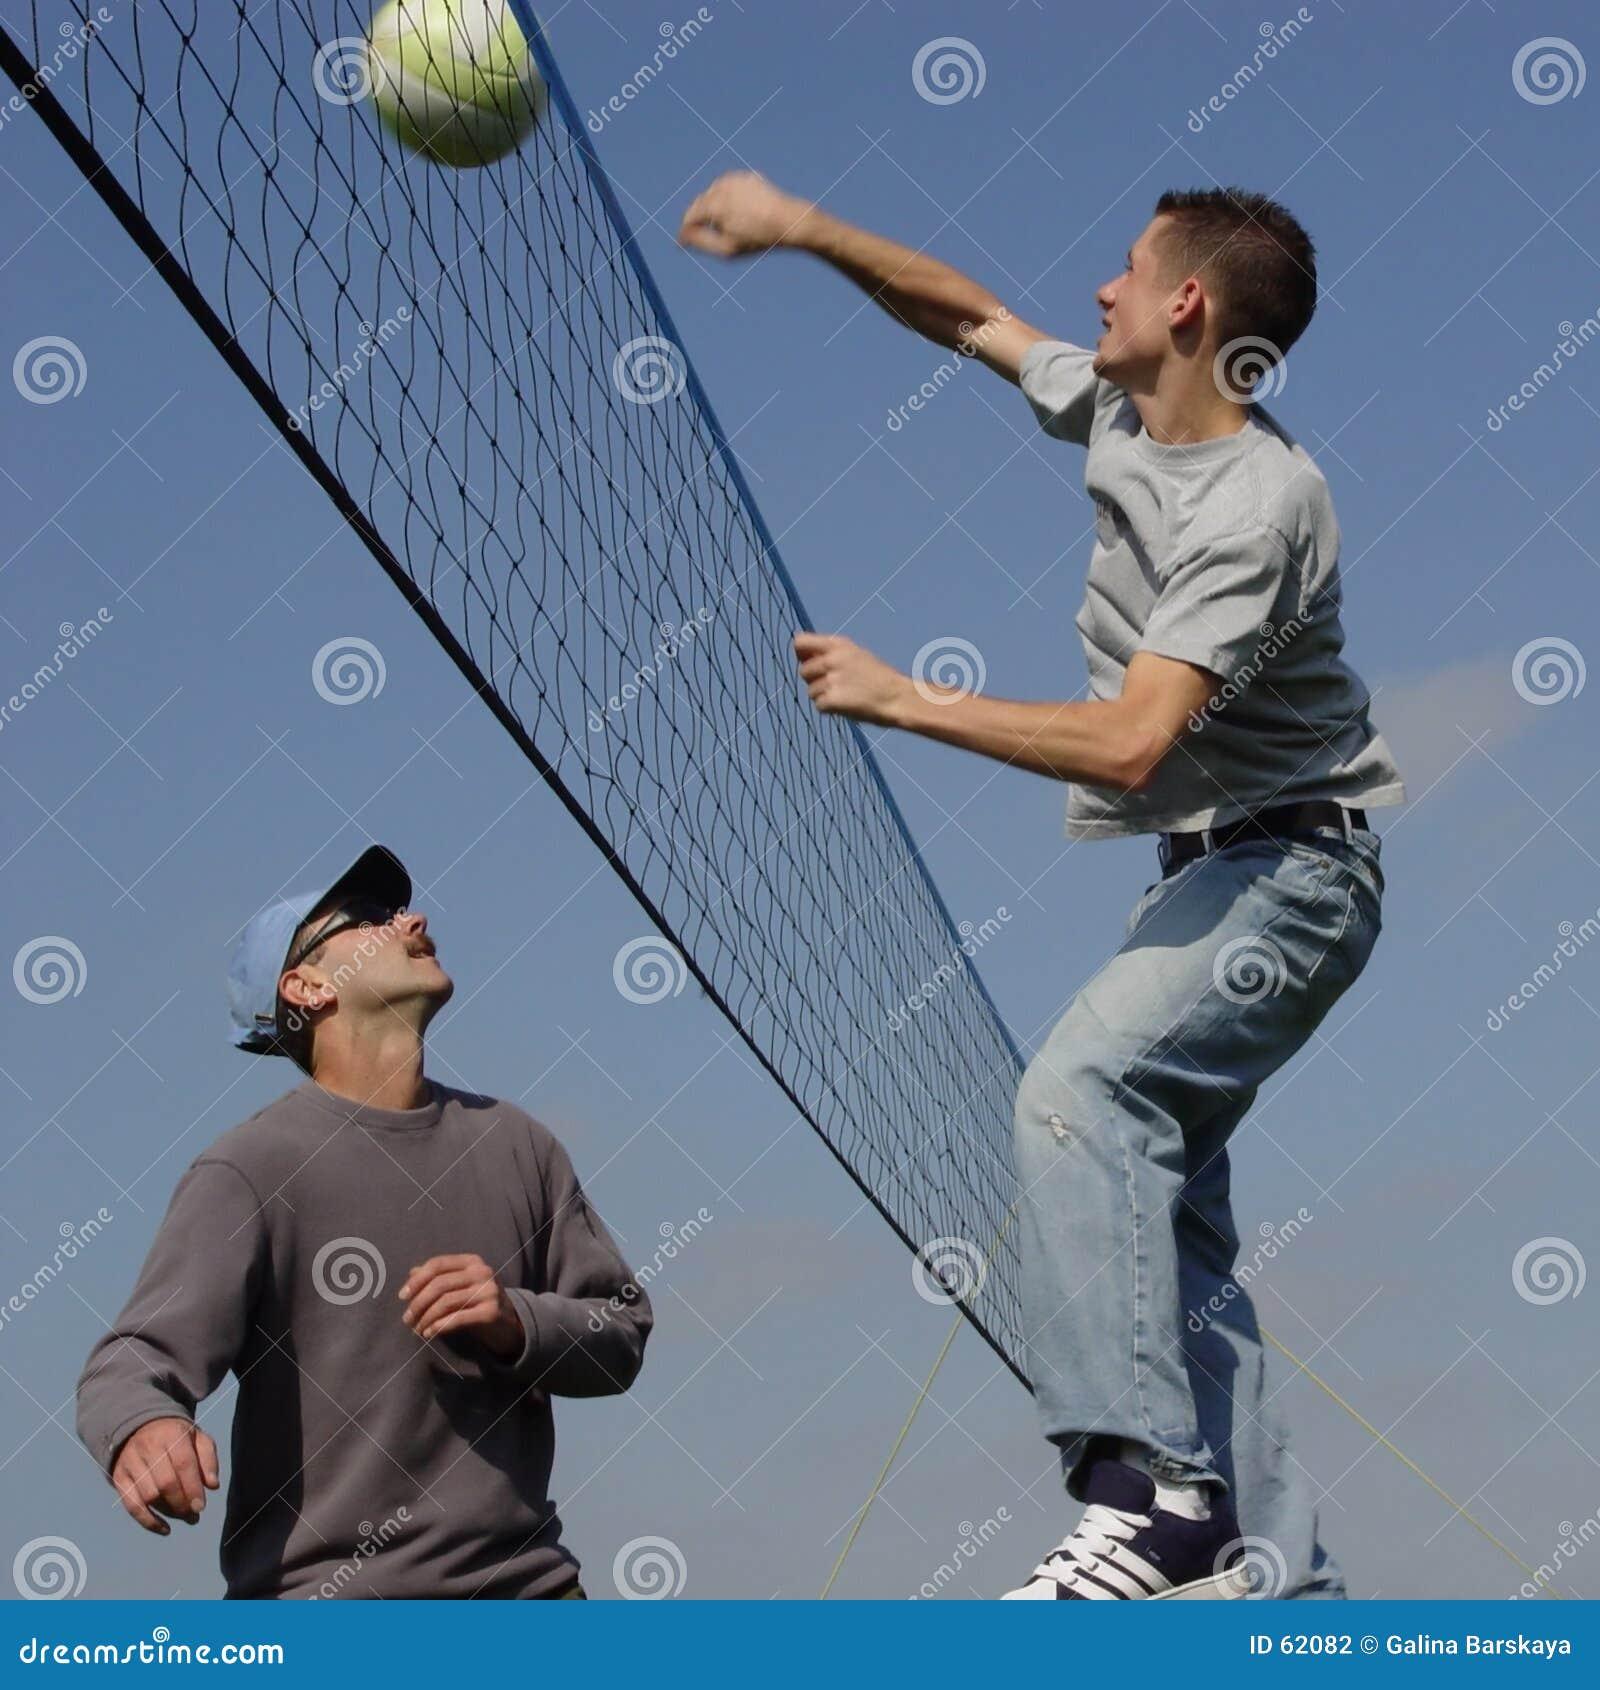 Download άτομα ζευγών που παίζουν την πετοσφαίριση Στοκ Εικόνες - εικόνα από άνθρωποι, υπαίθριος: 62082